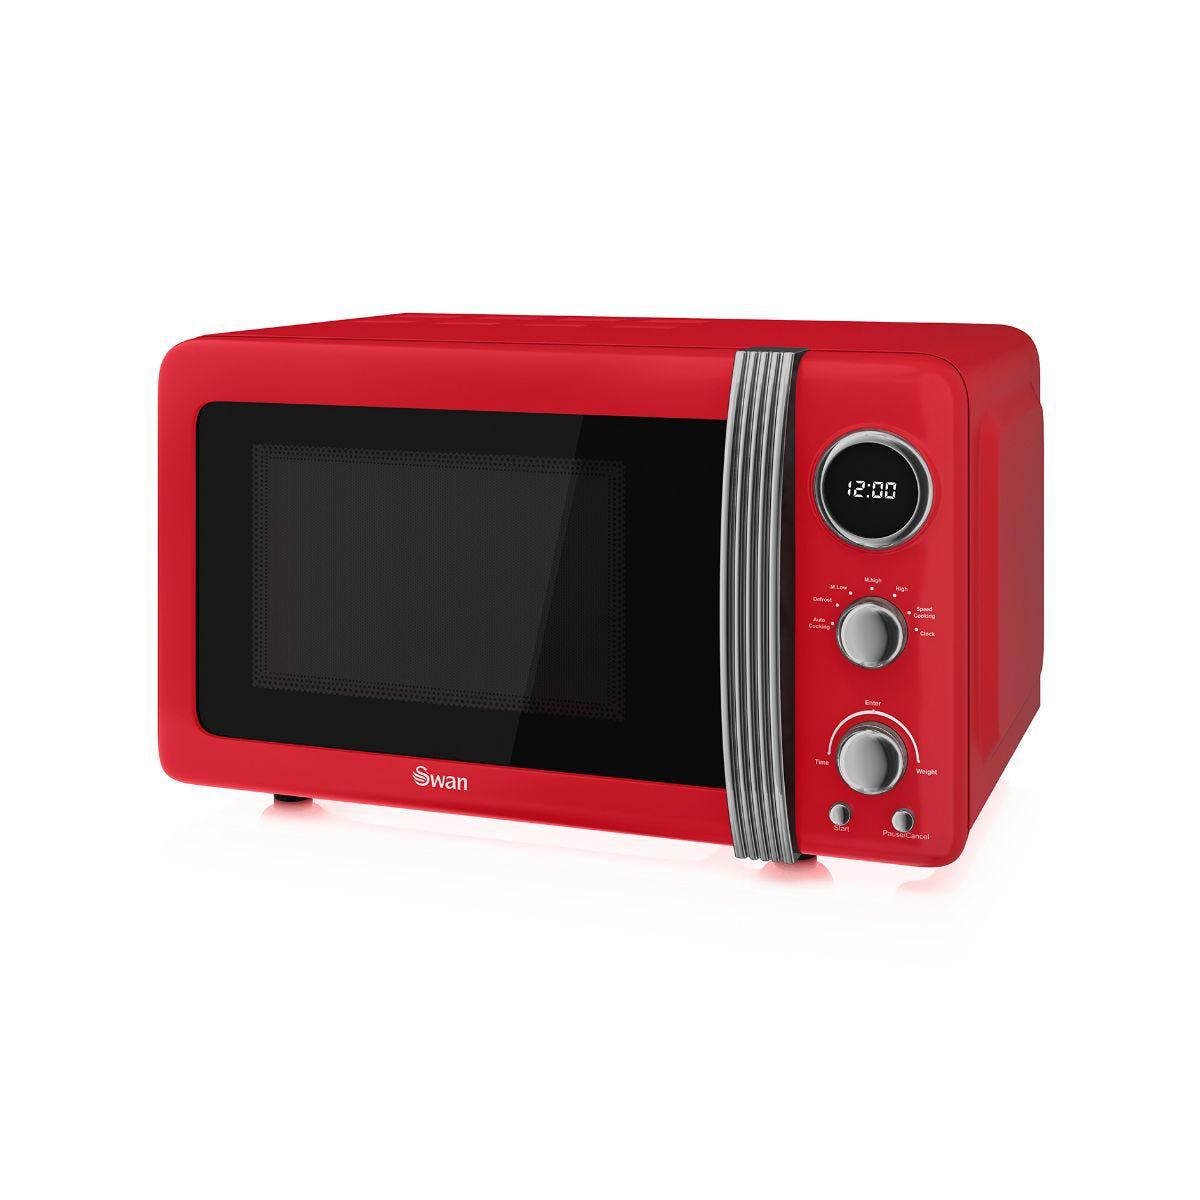 Image of 800W Retro Digital Microwave, Red